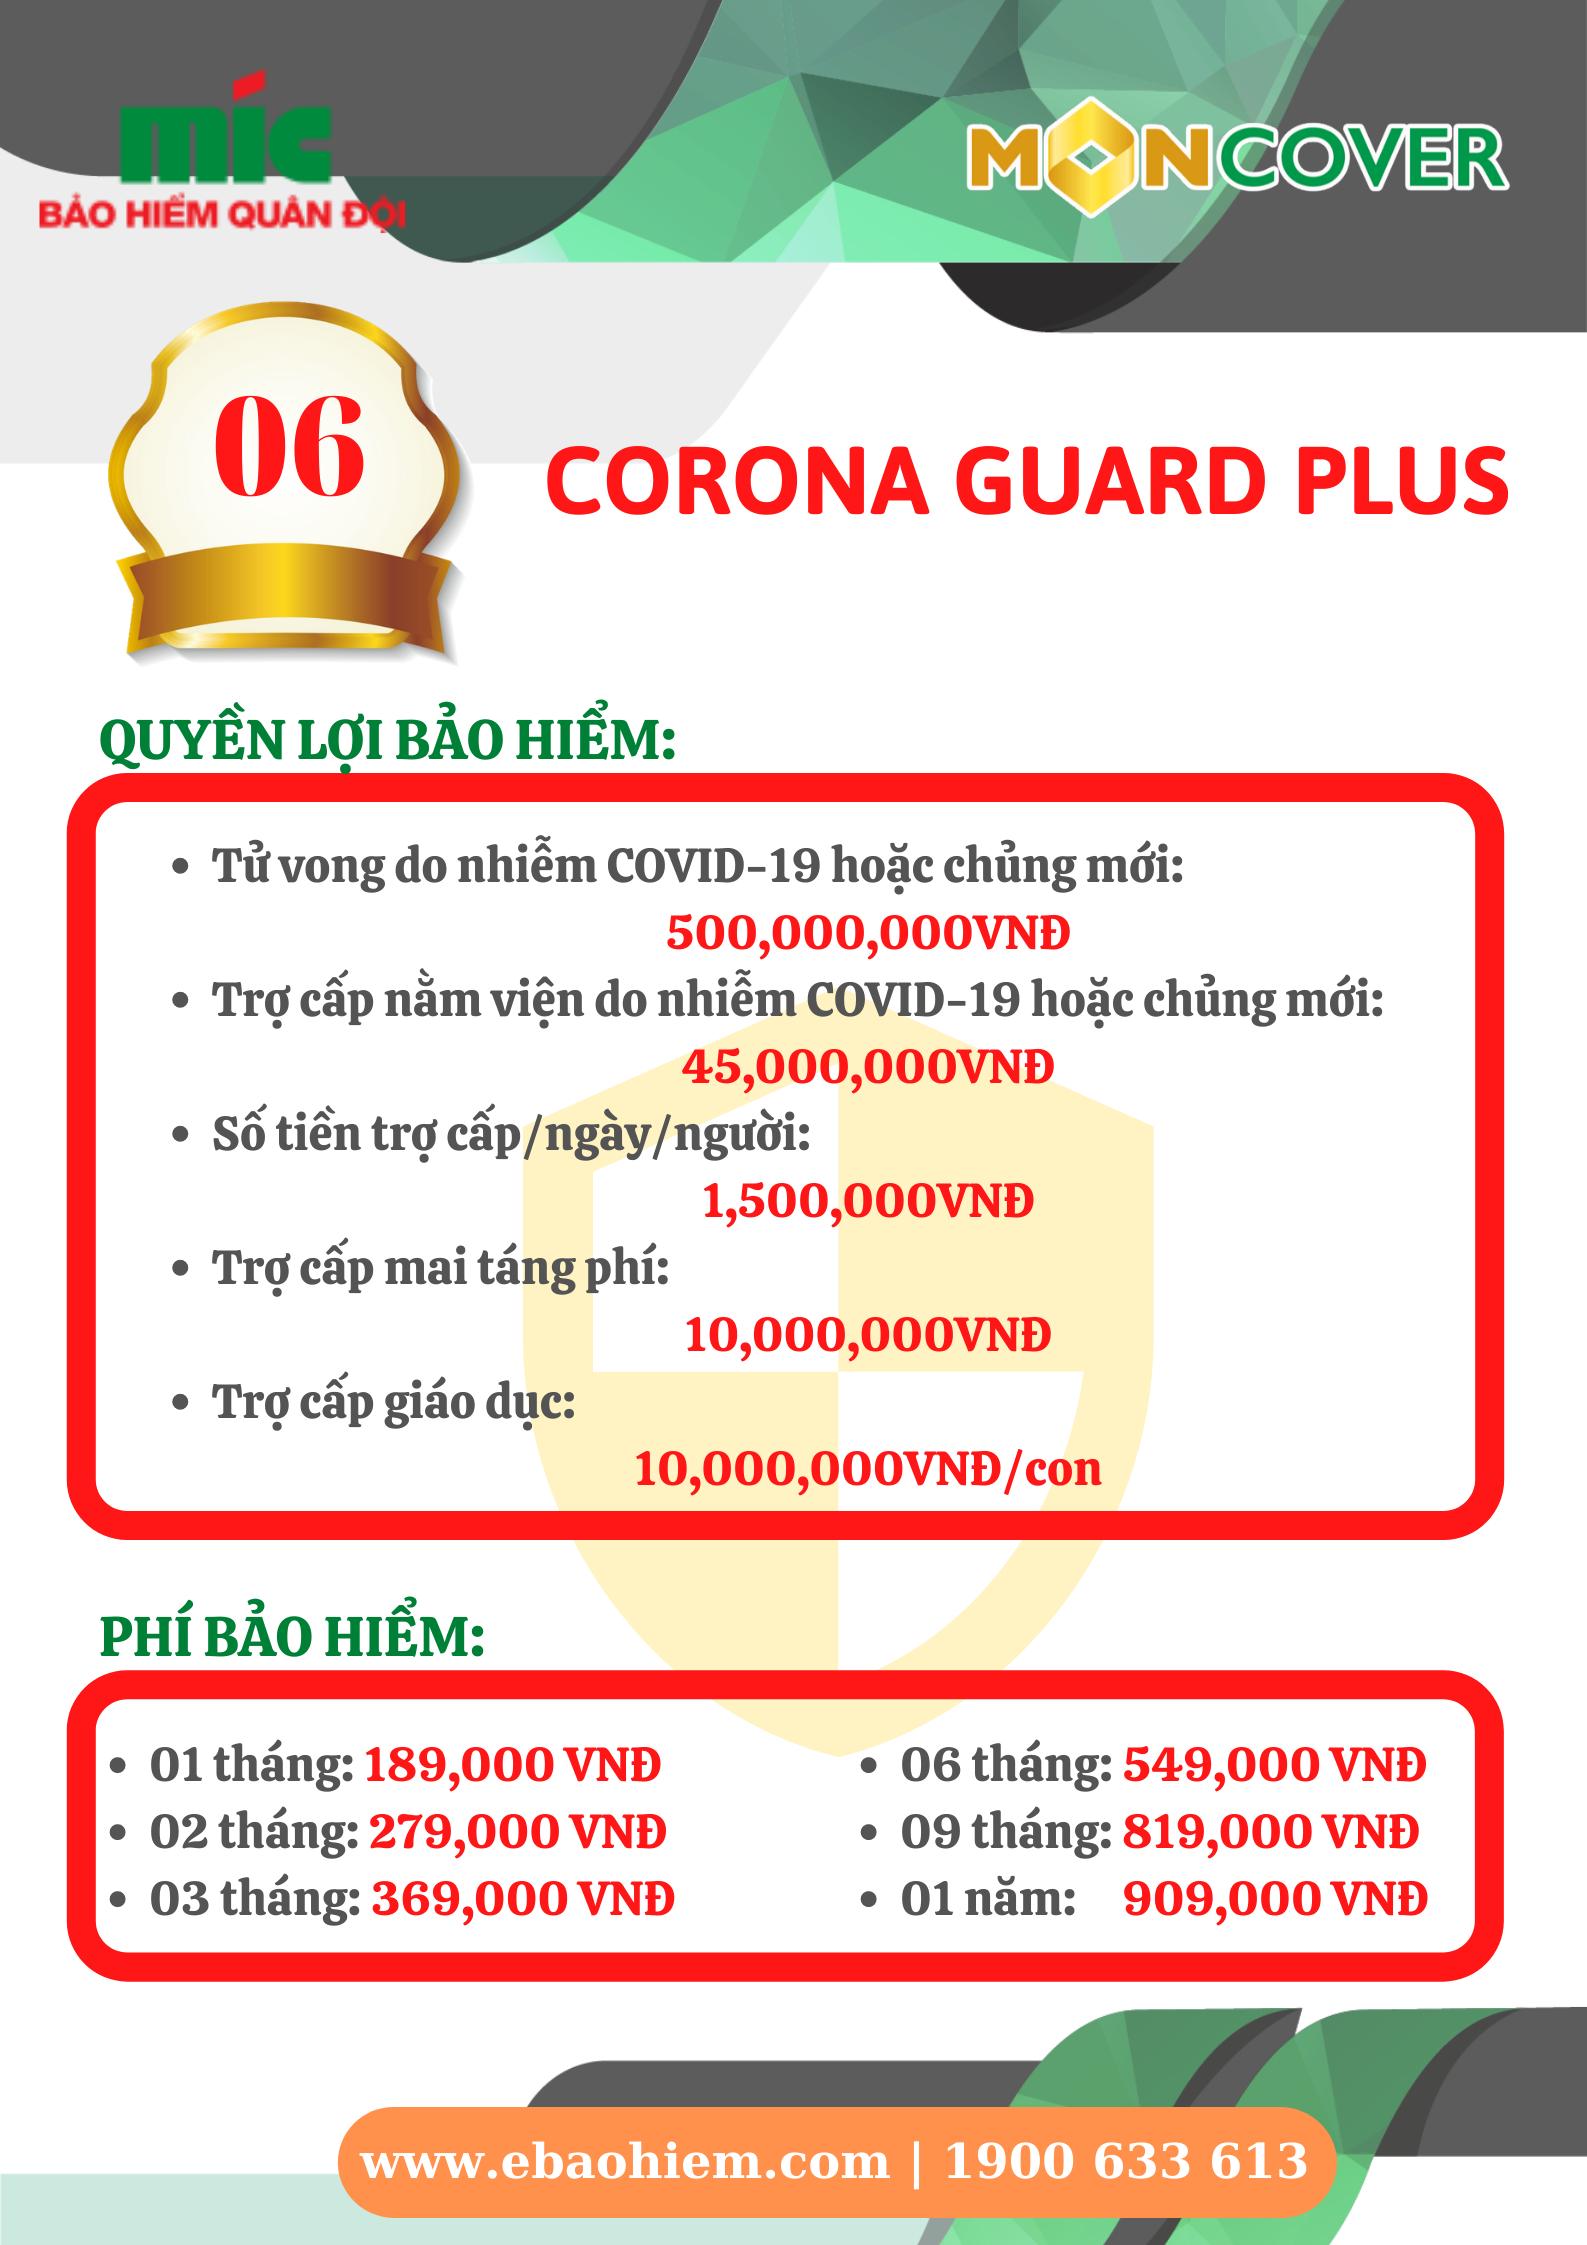 Bảo hiểm CORONA GUARD PLUS